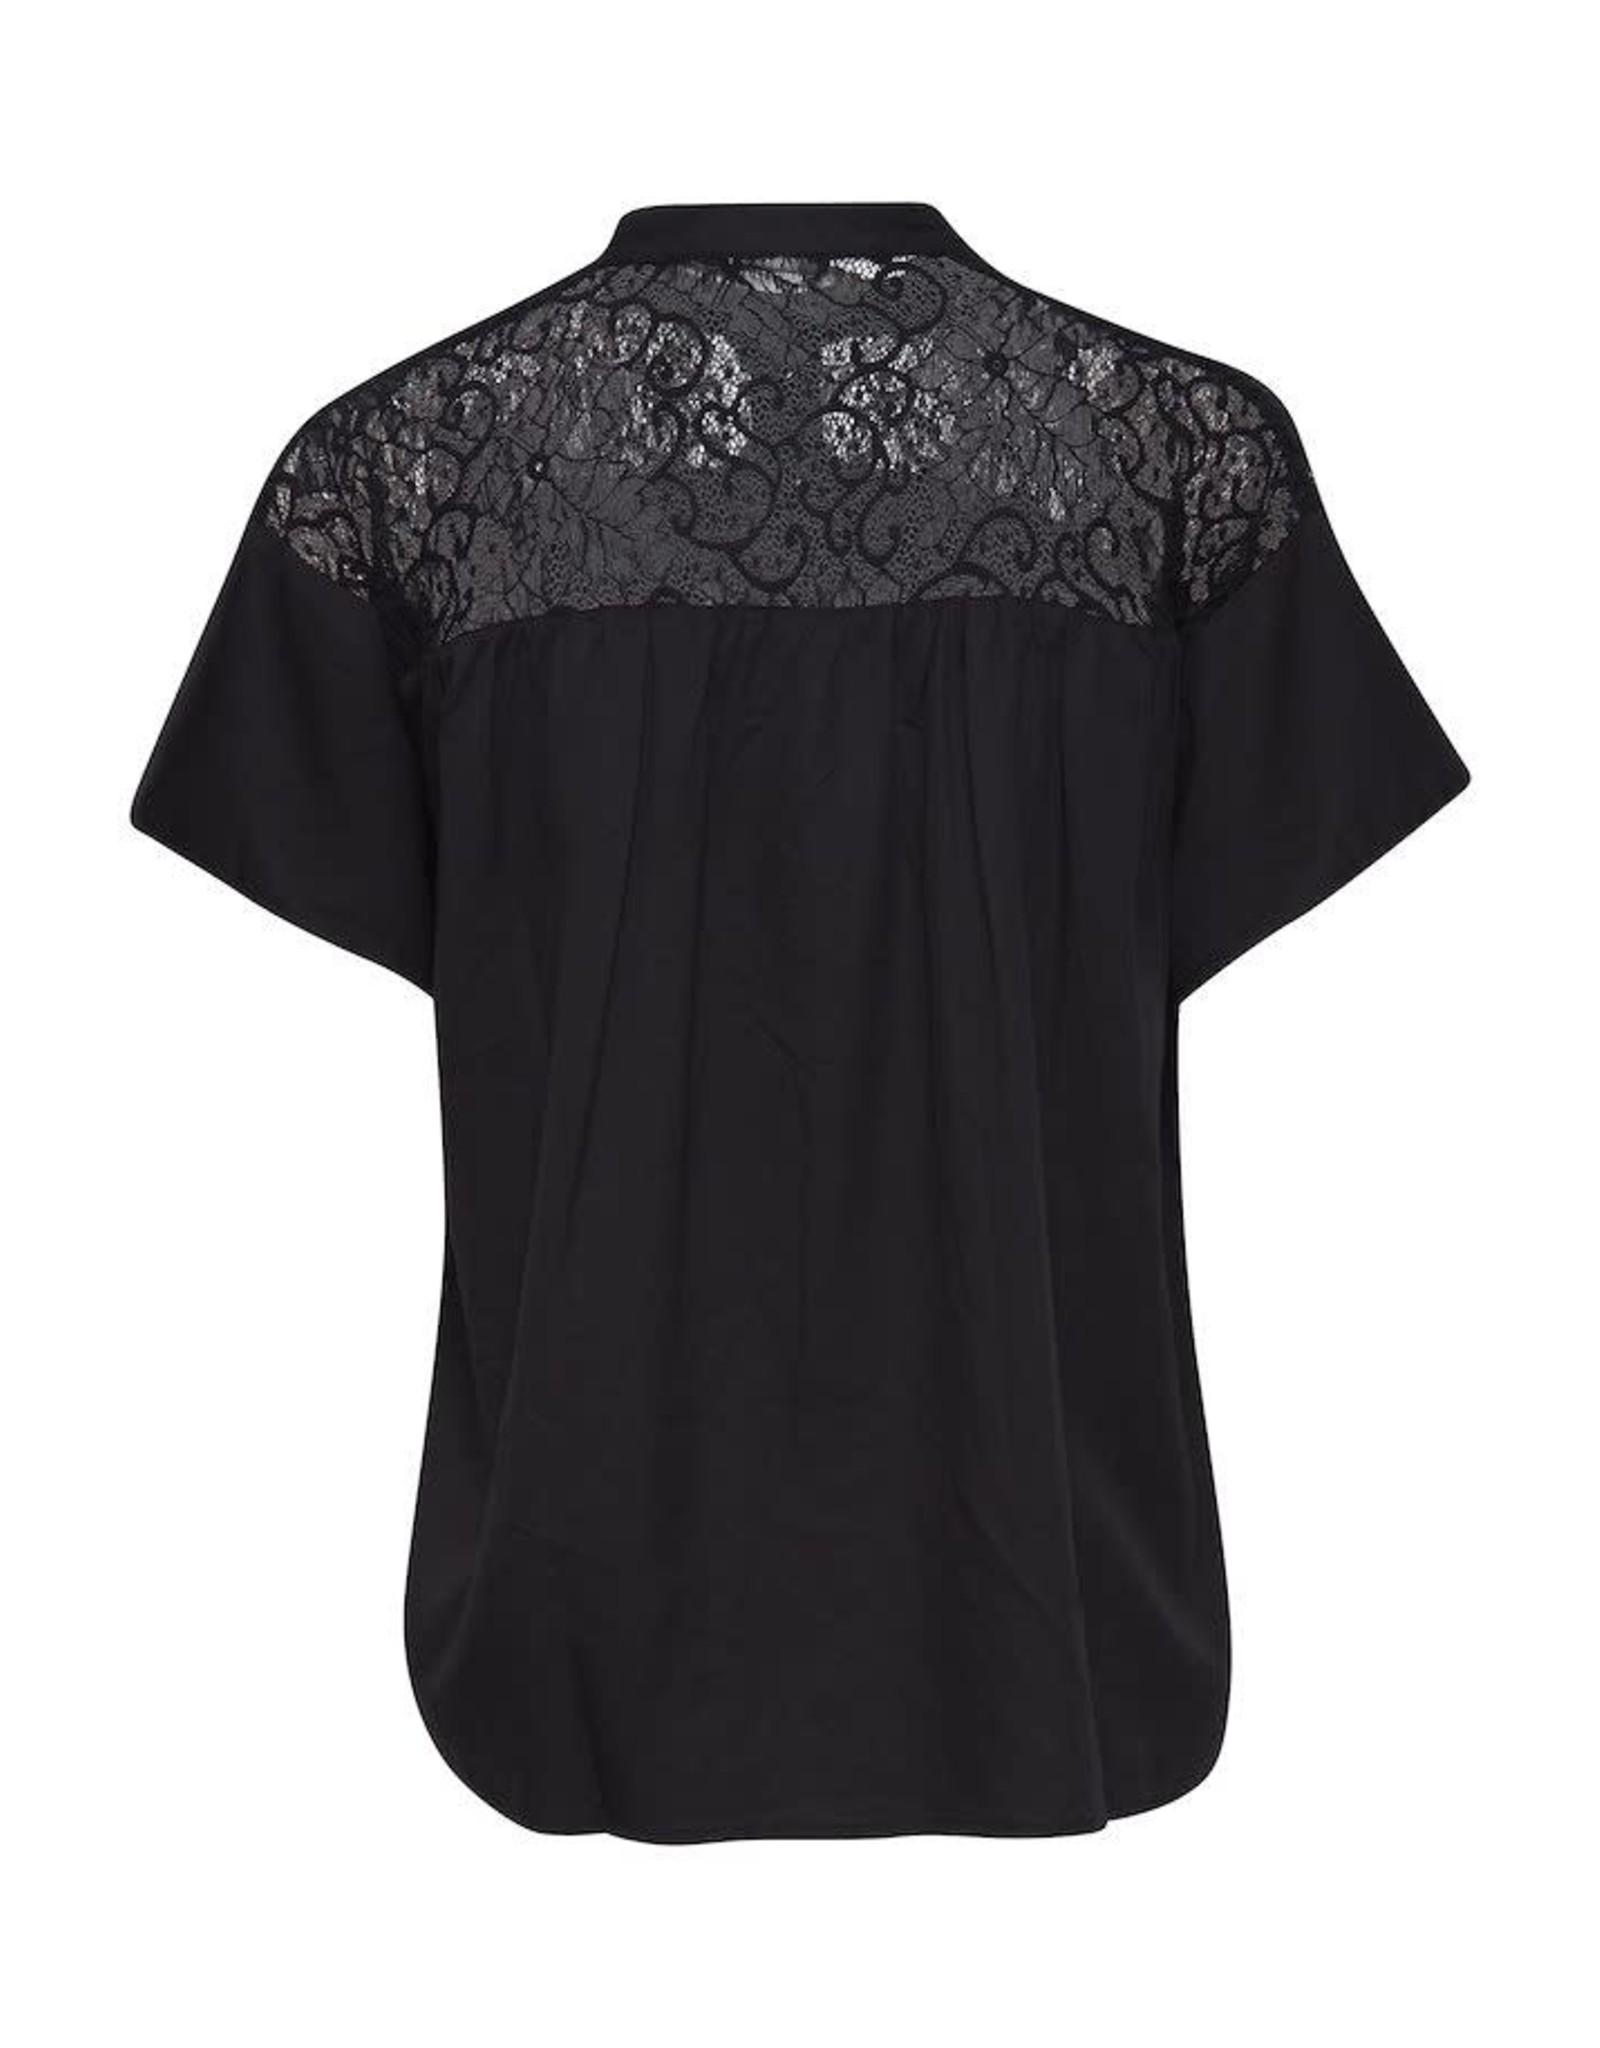 ICHI ICHI - Immilla blouse (black)